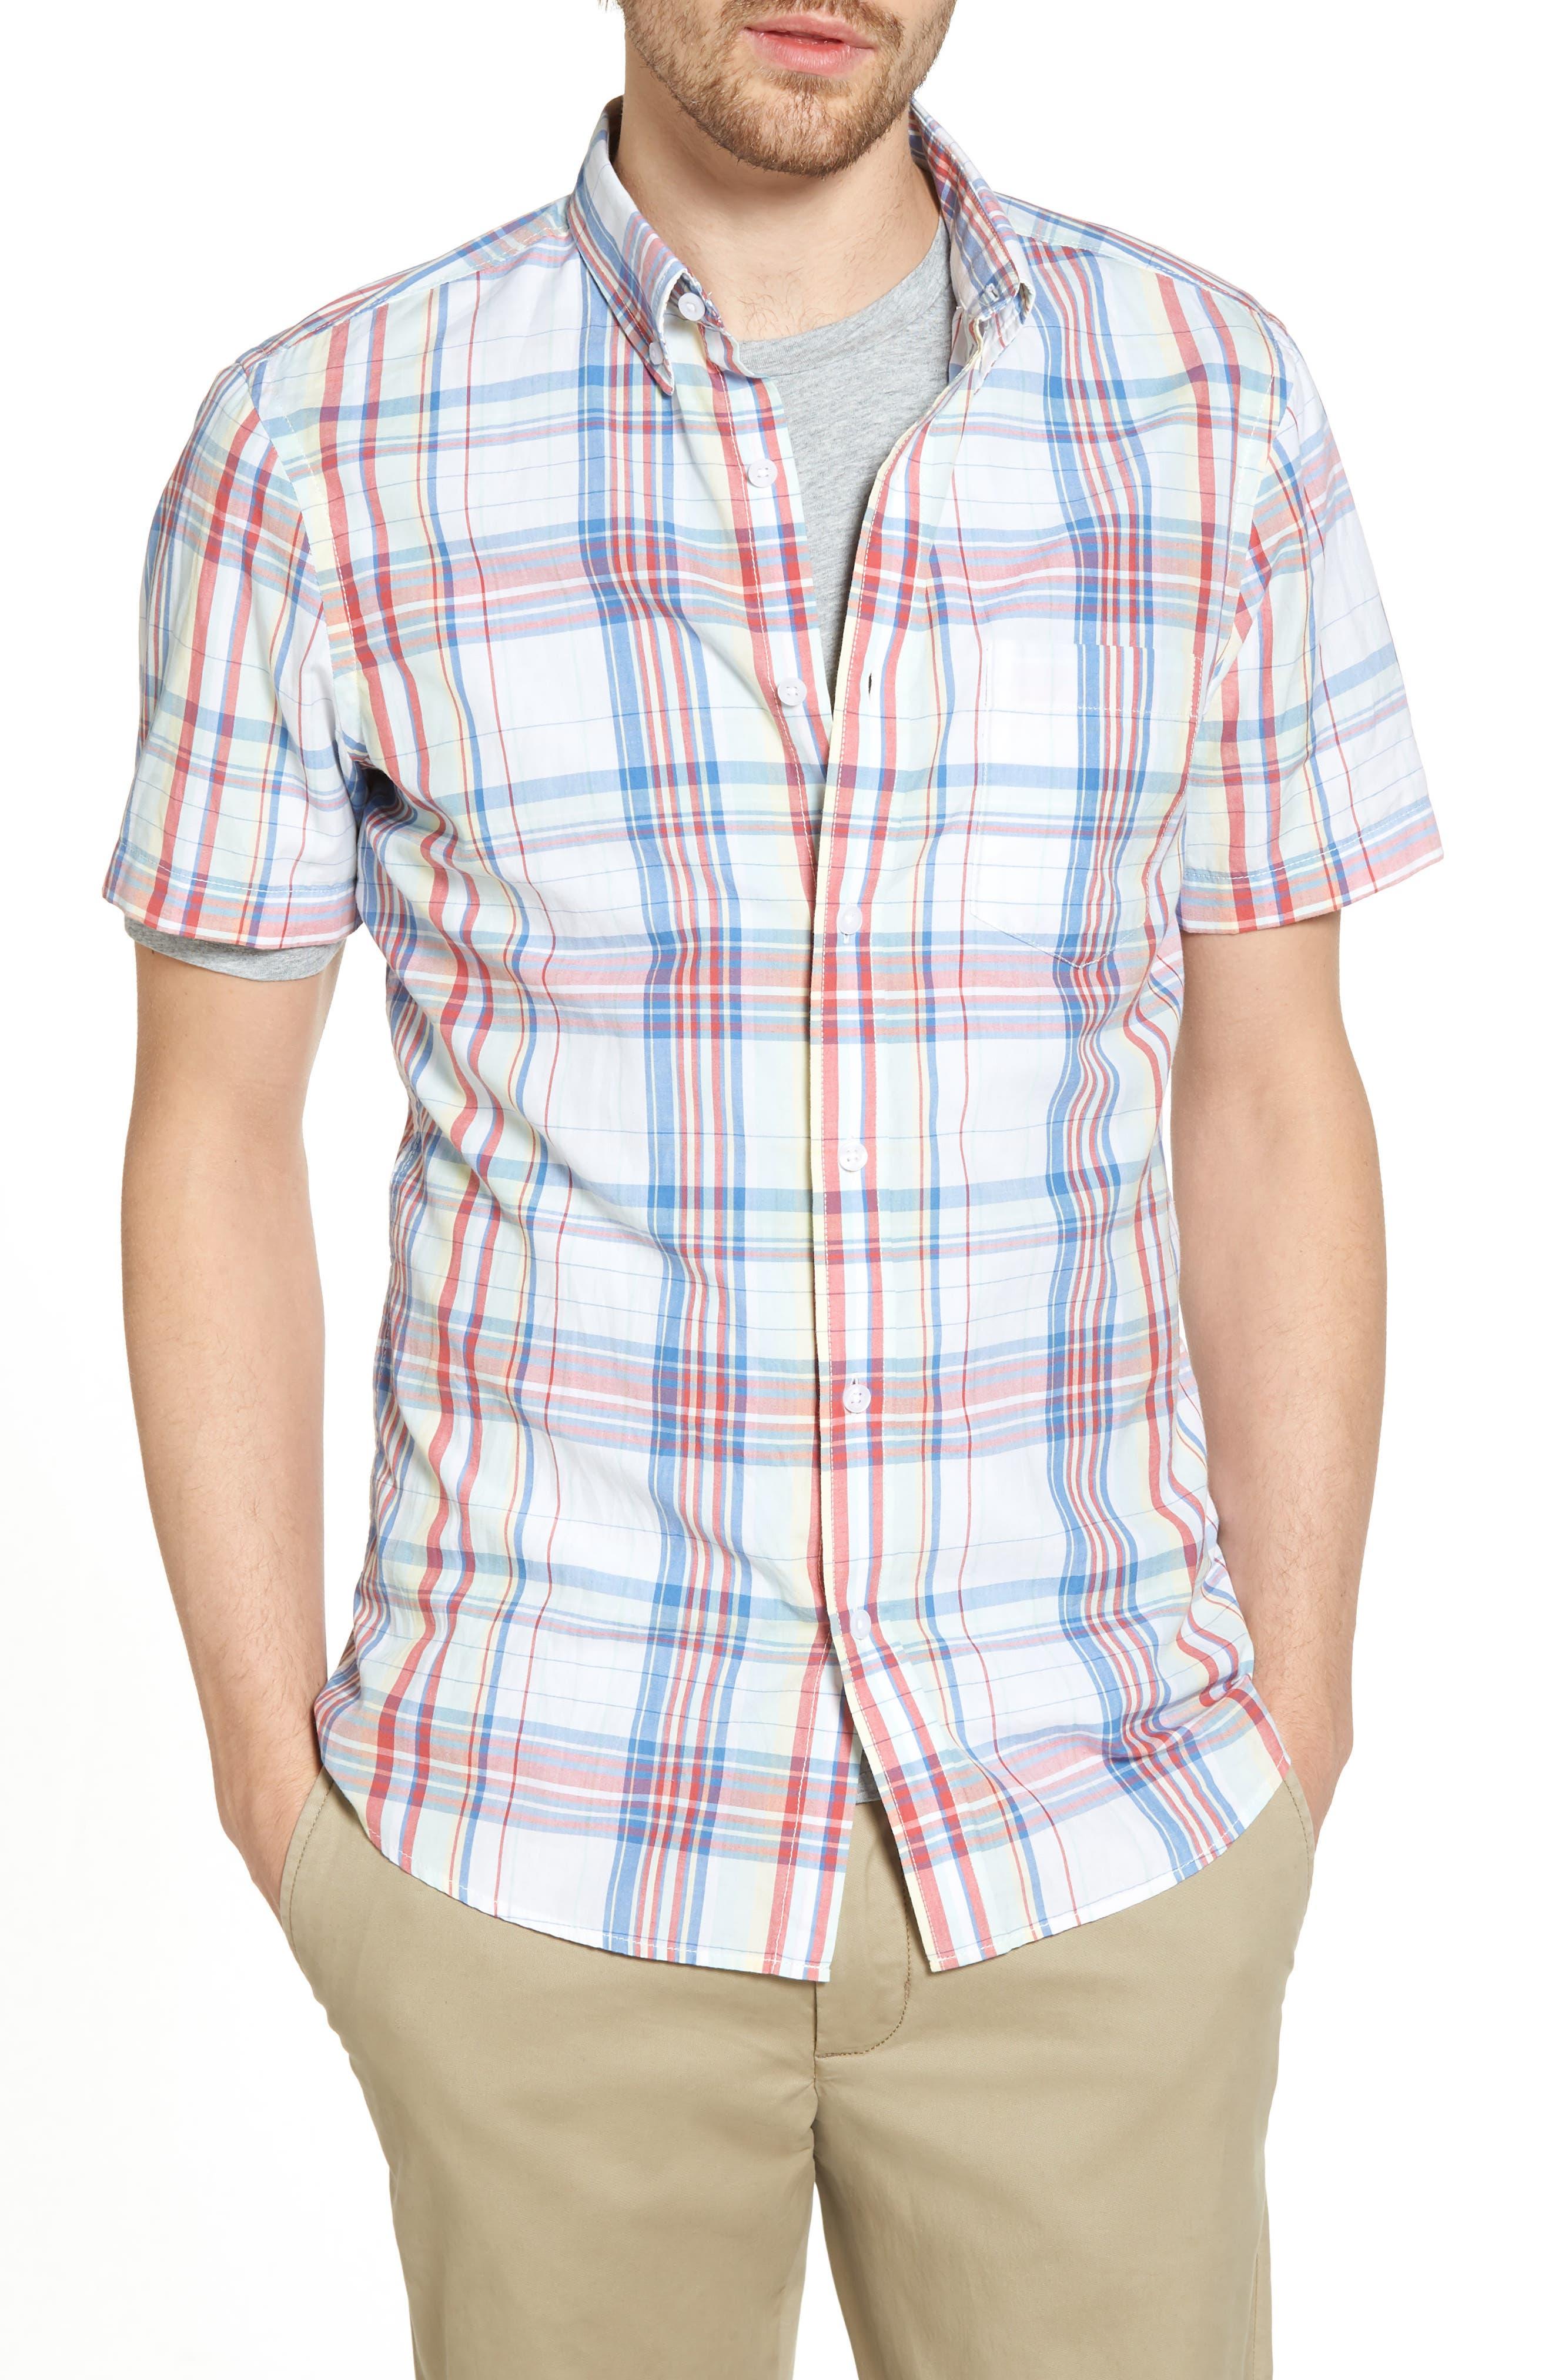 Trim Fit Plaid Short Sleeve Sport Shirt,                             Main thumbnail 1, color,                             White Red Multi Plaid